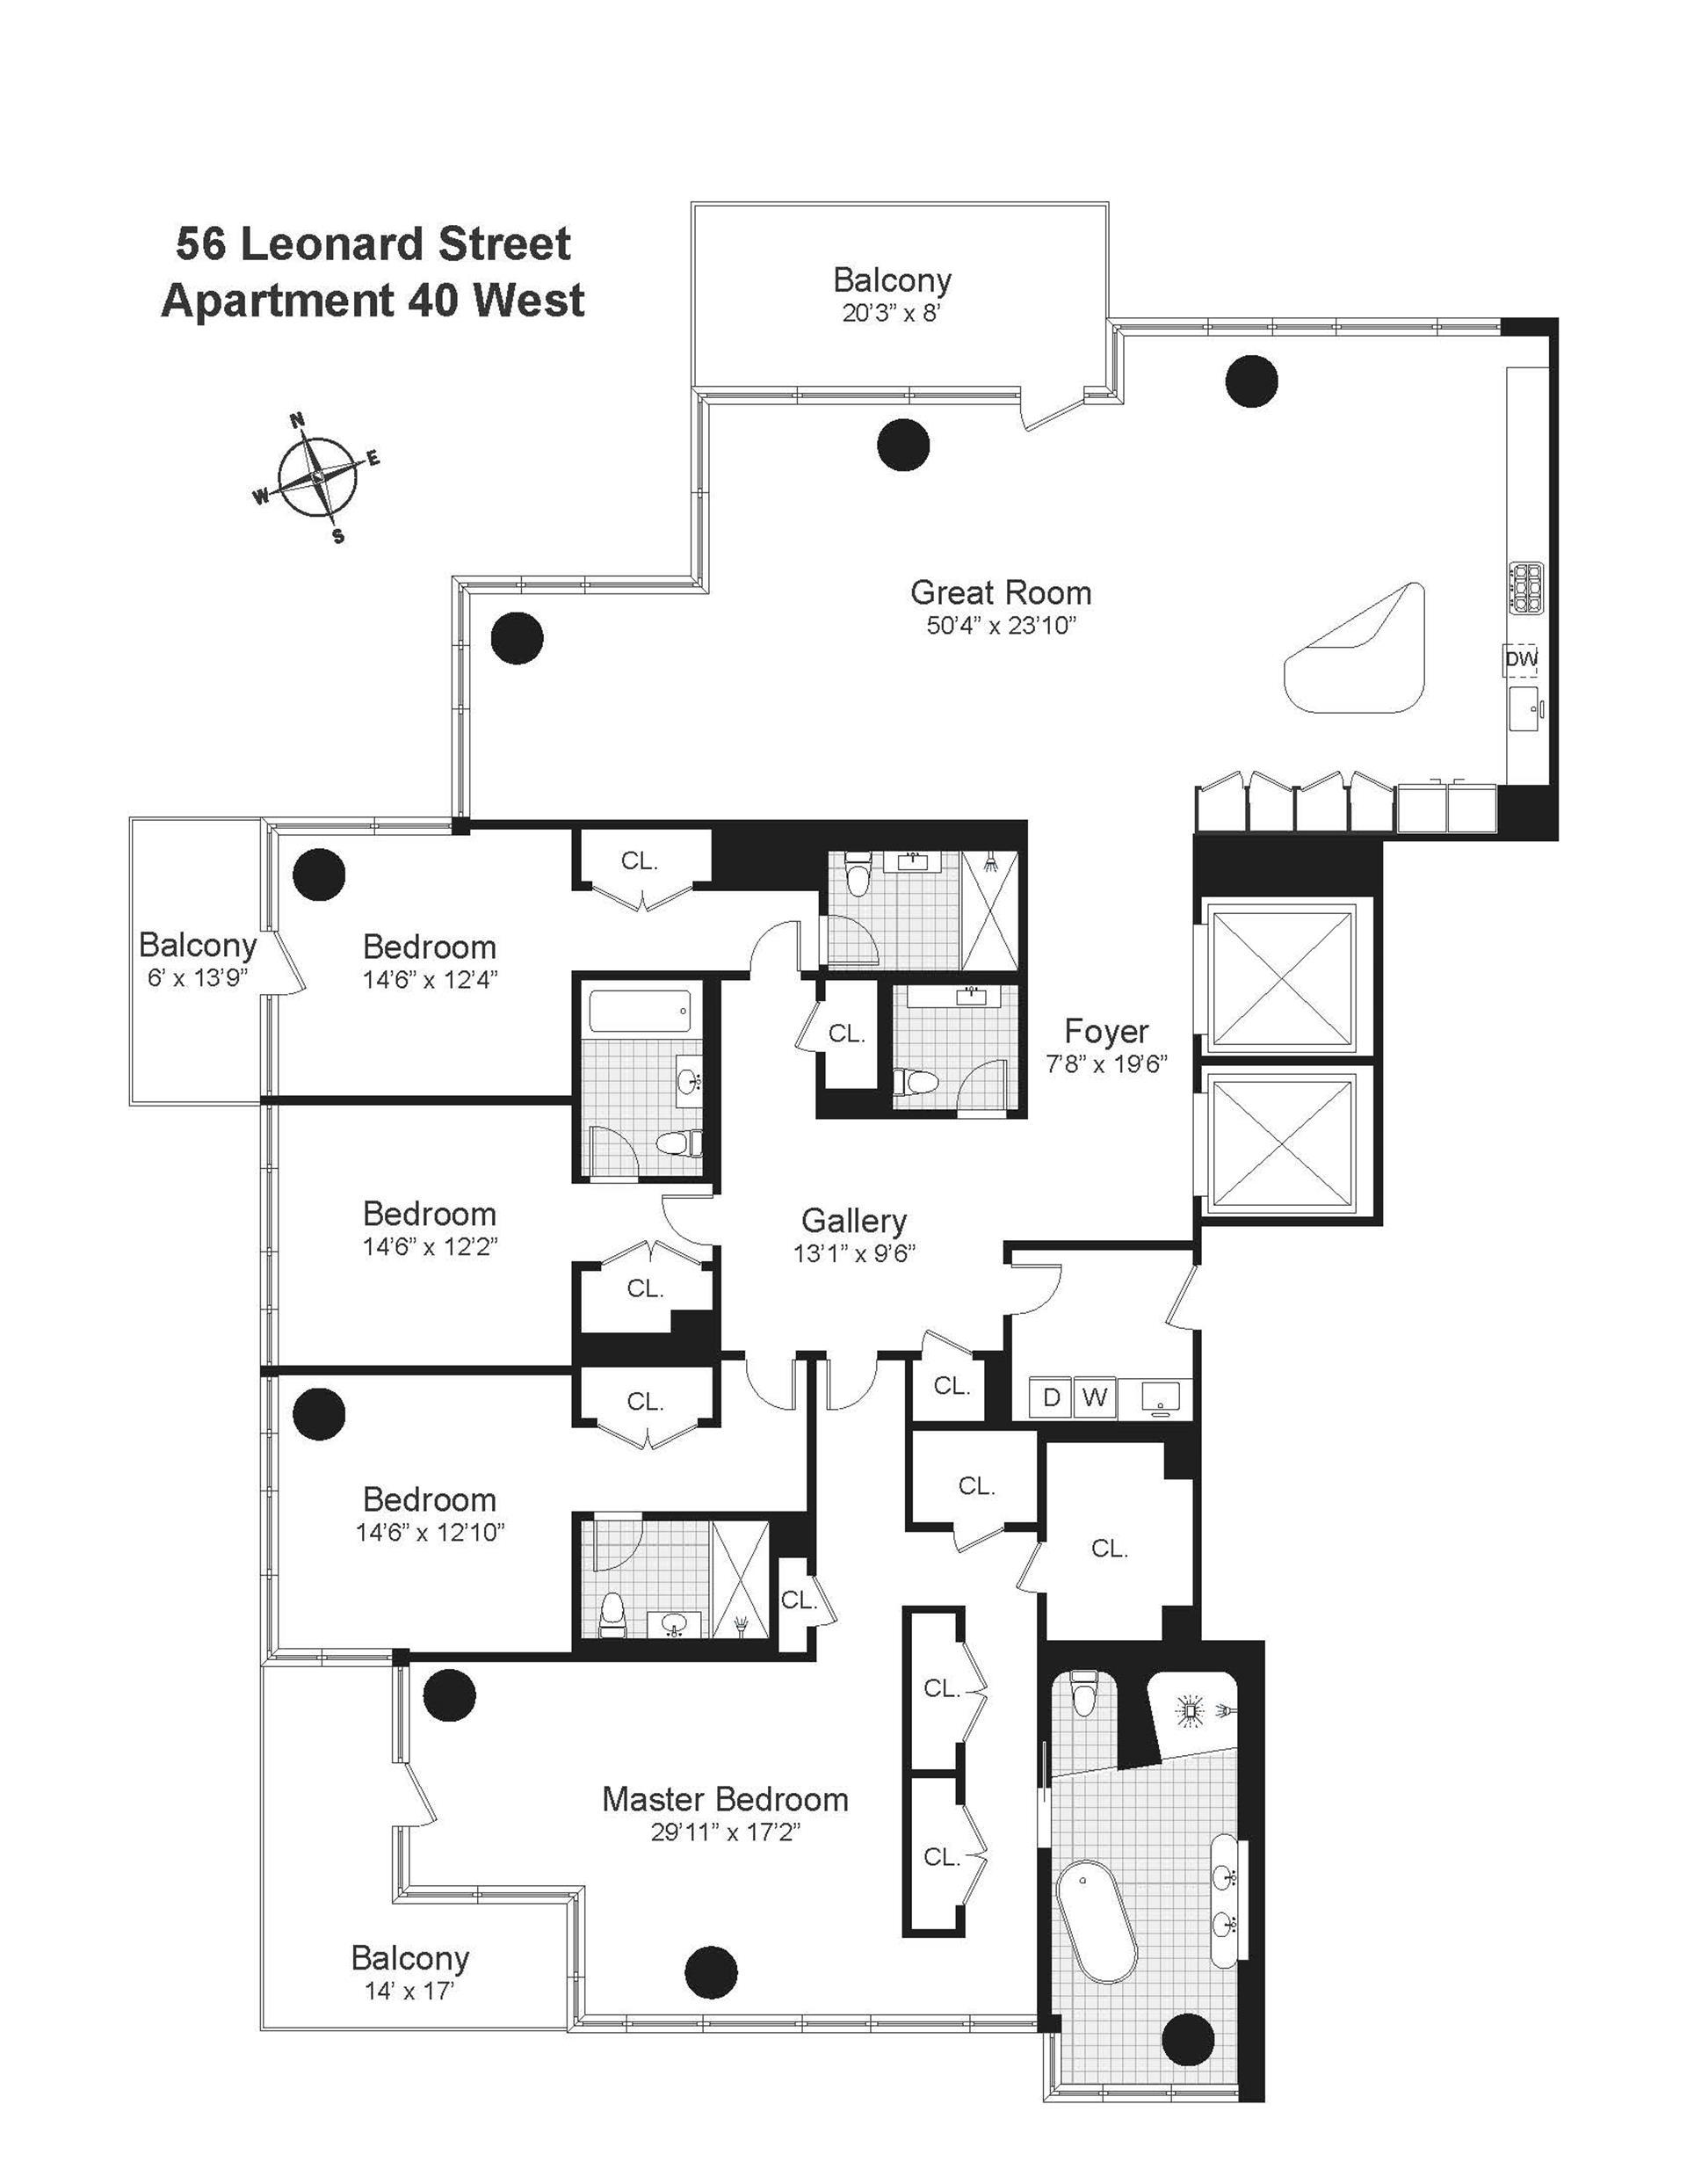 Floor plan of 56 Leonard St, 40WEST - TriBeCa, New York